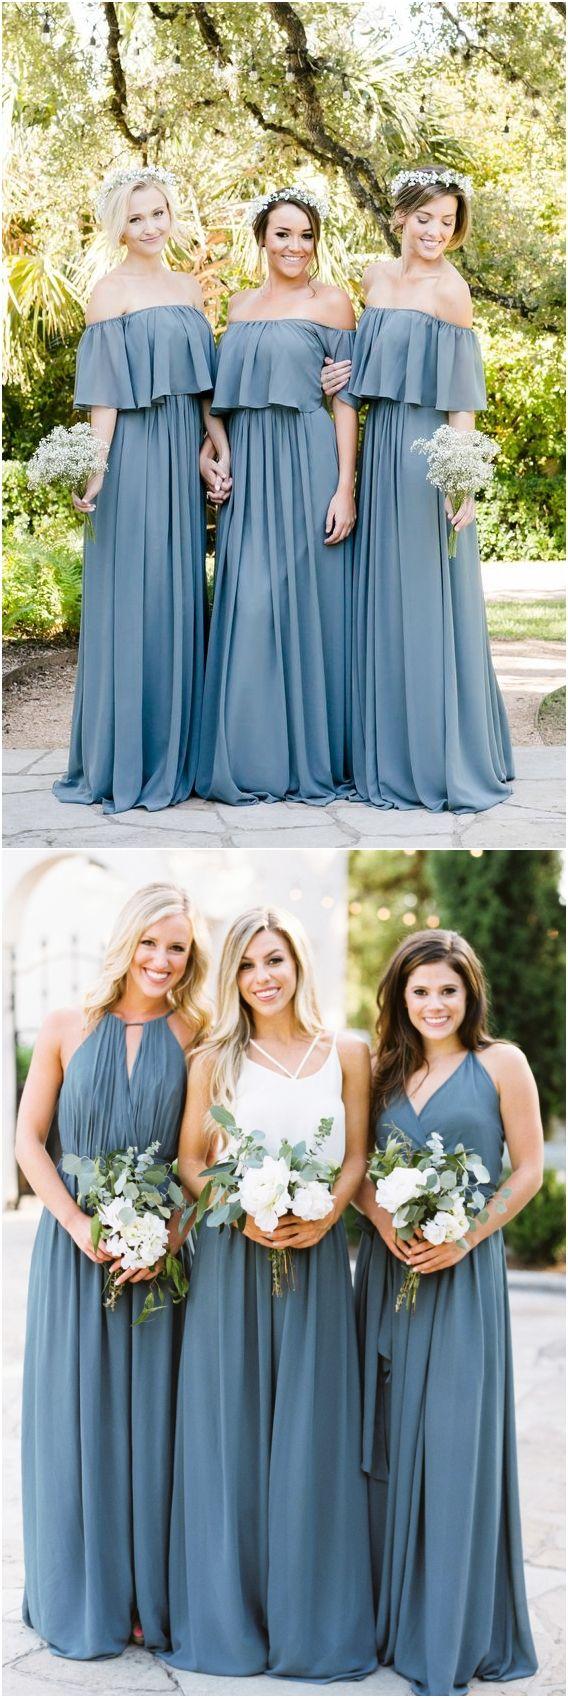 Top bridesmaid dress trends for dusty blue weddingideas